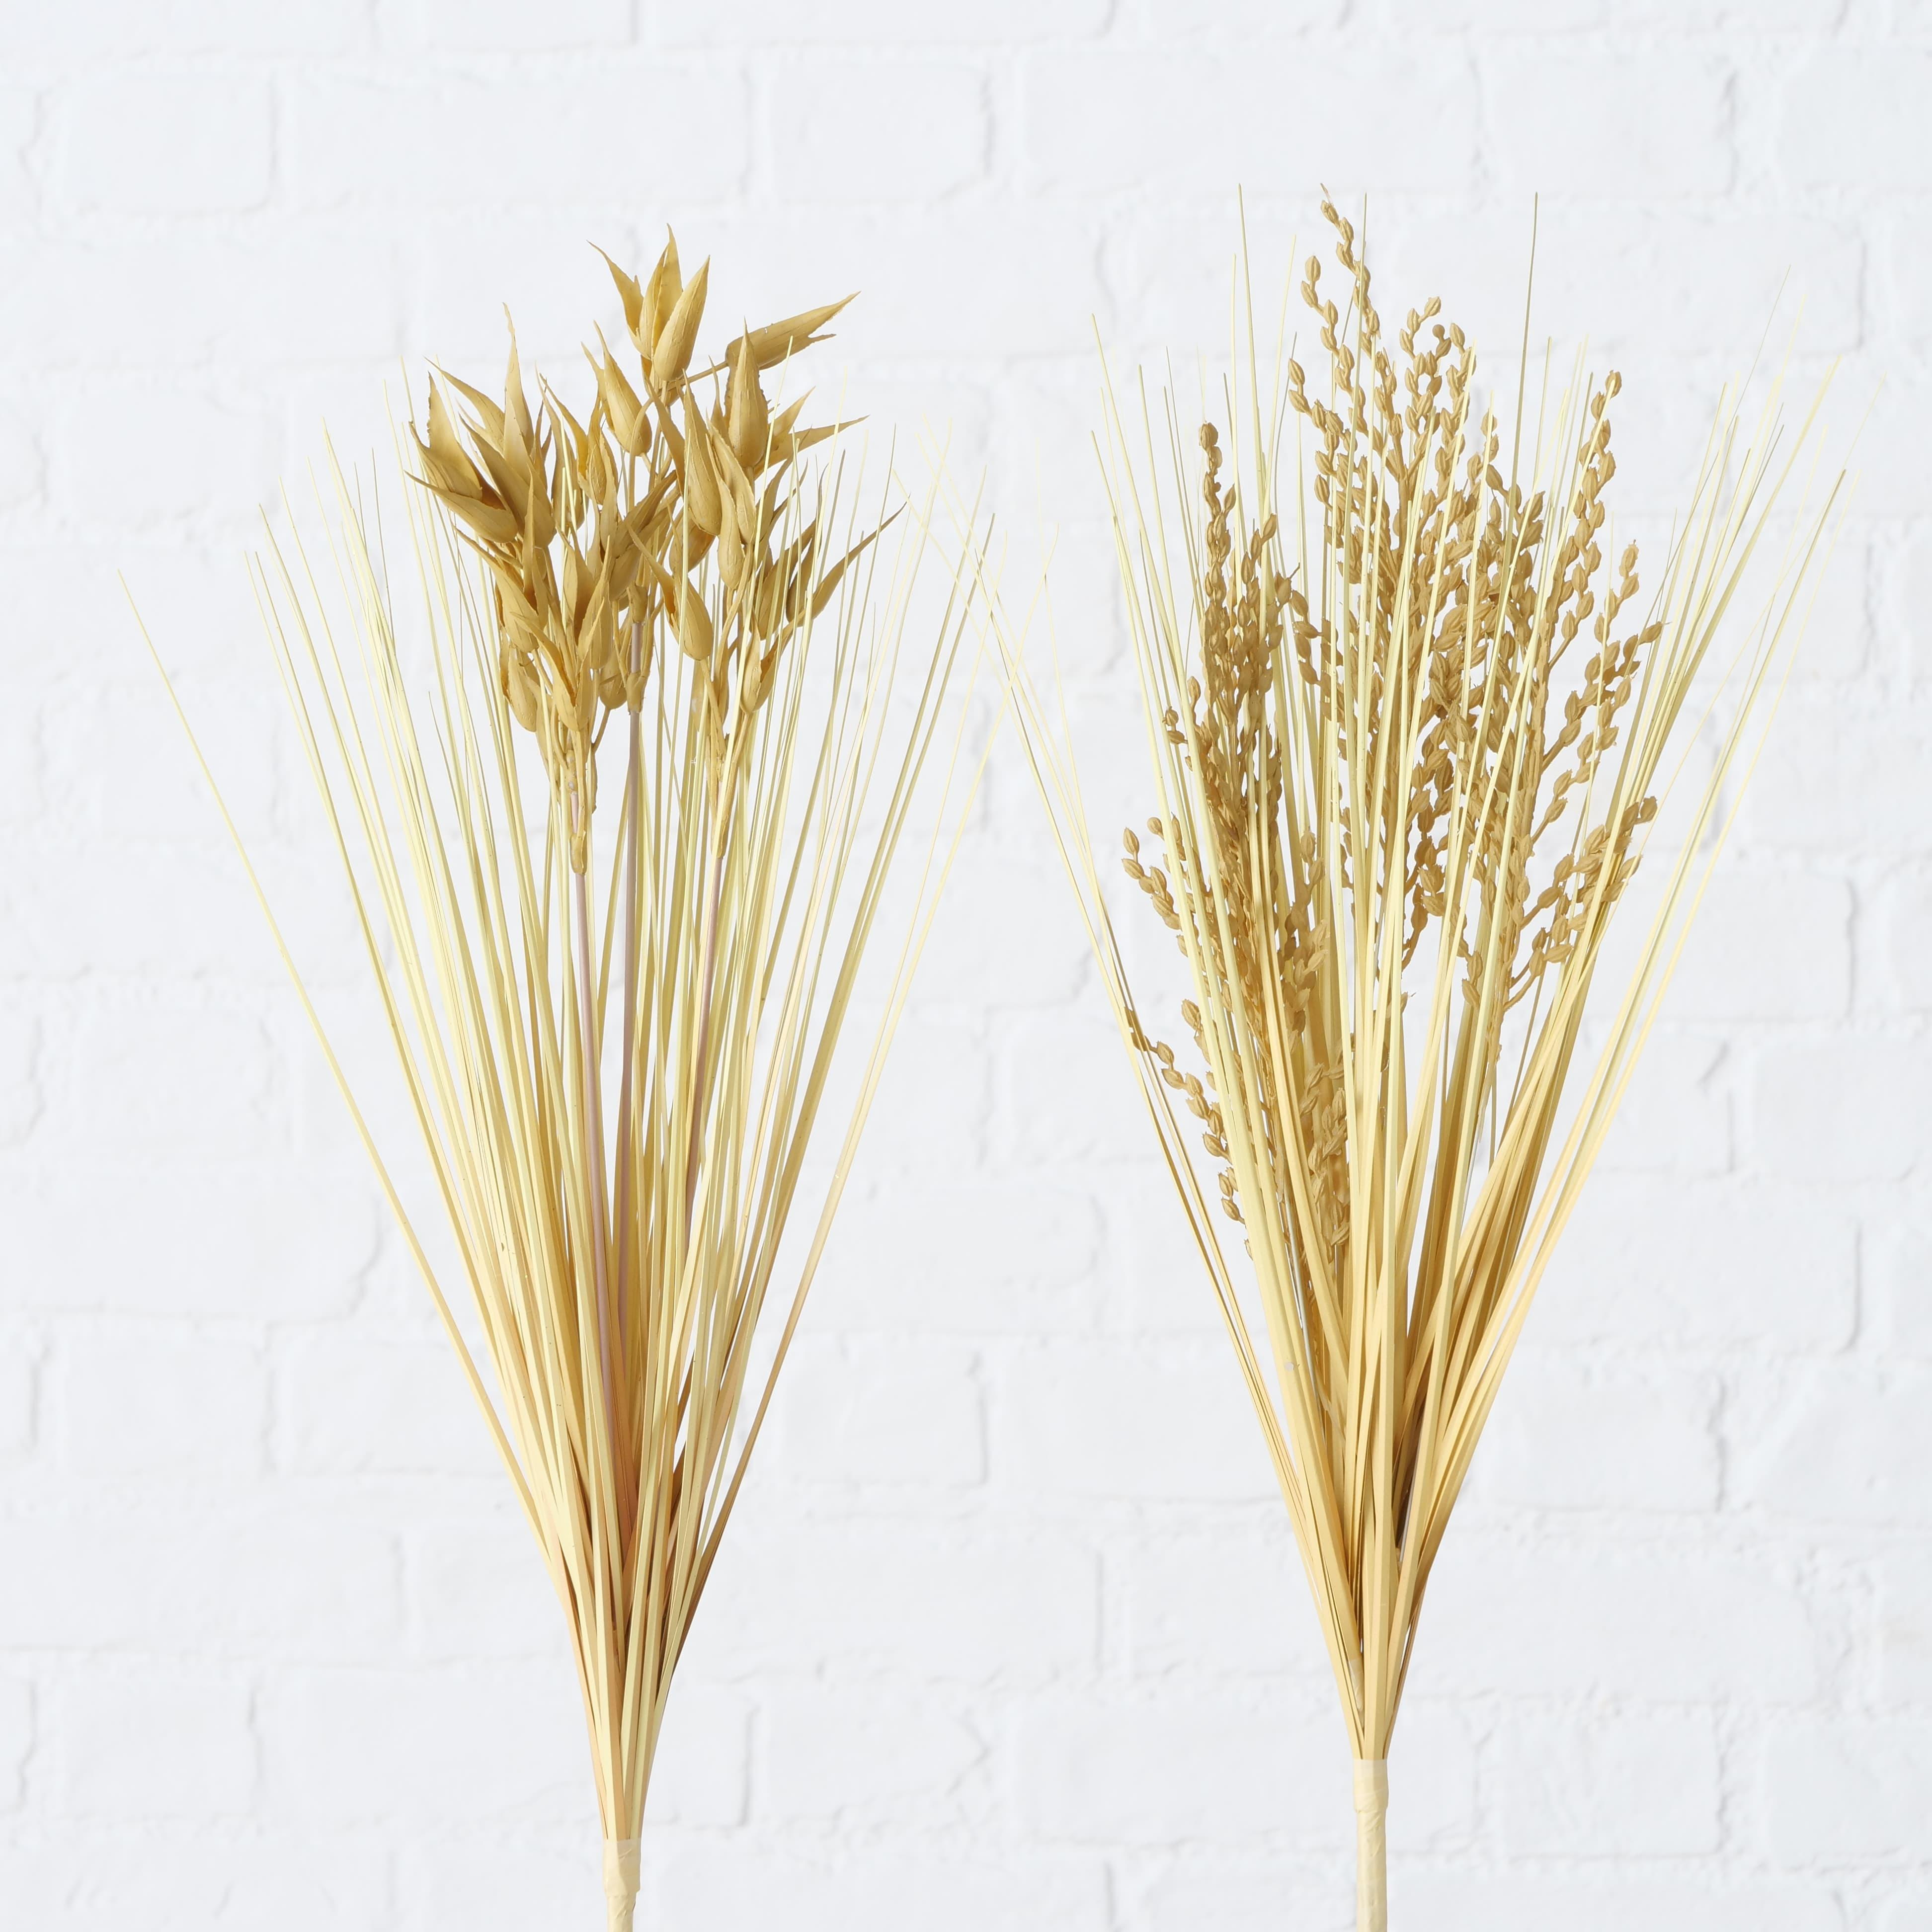 Ramura decorativa artificiala Bellflower Rice Natural, Modele Asortate, H48 cm imagine